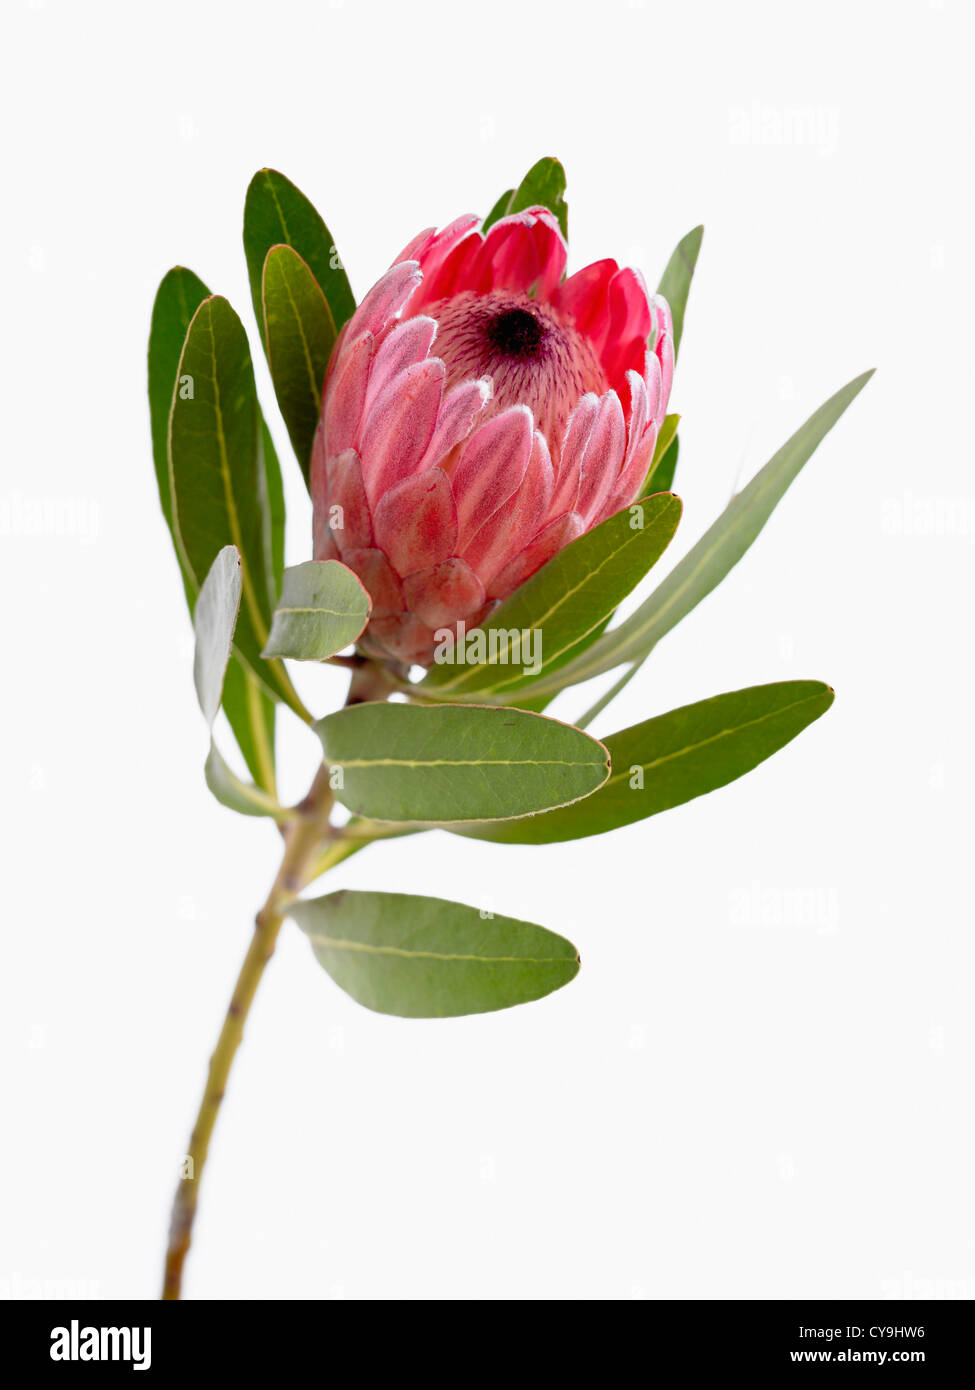 Protea Neriifolia X Susannae Pink Ice Single Flower On Leafy Stem Stock Photo Alamy